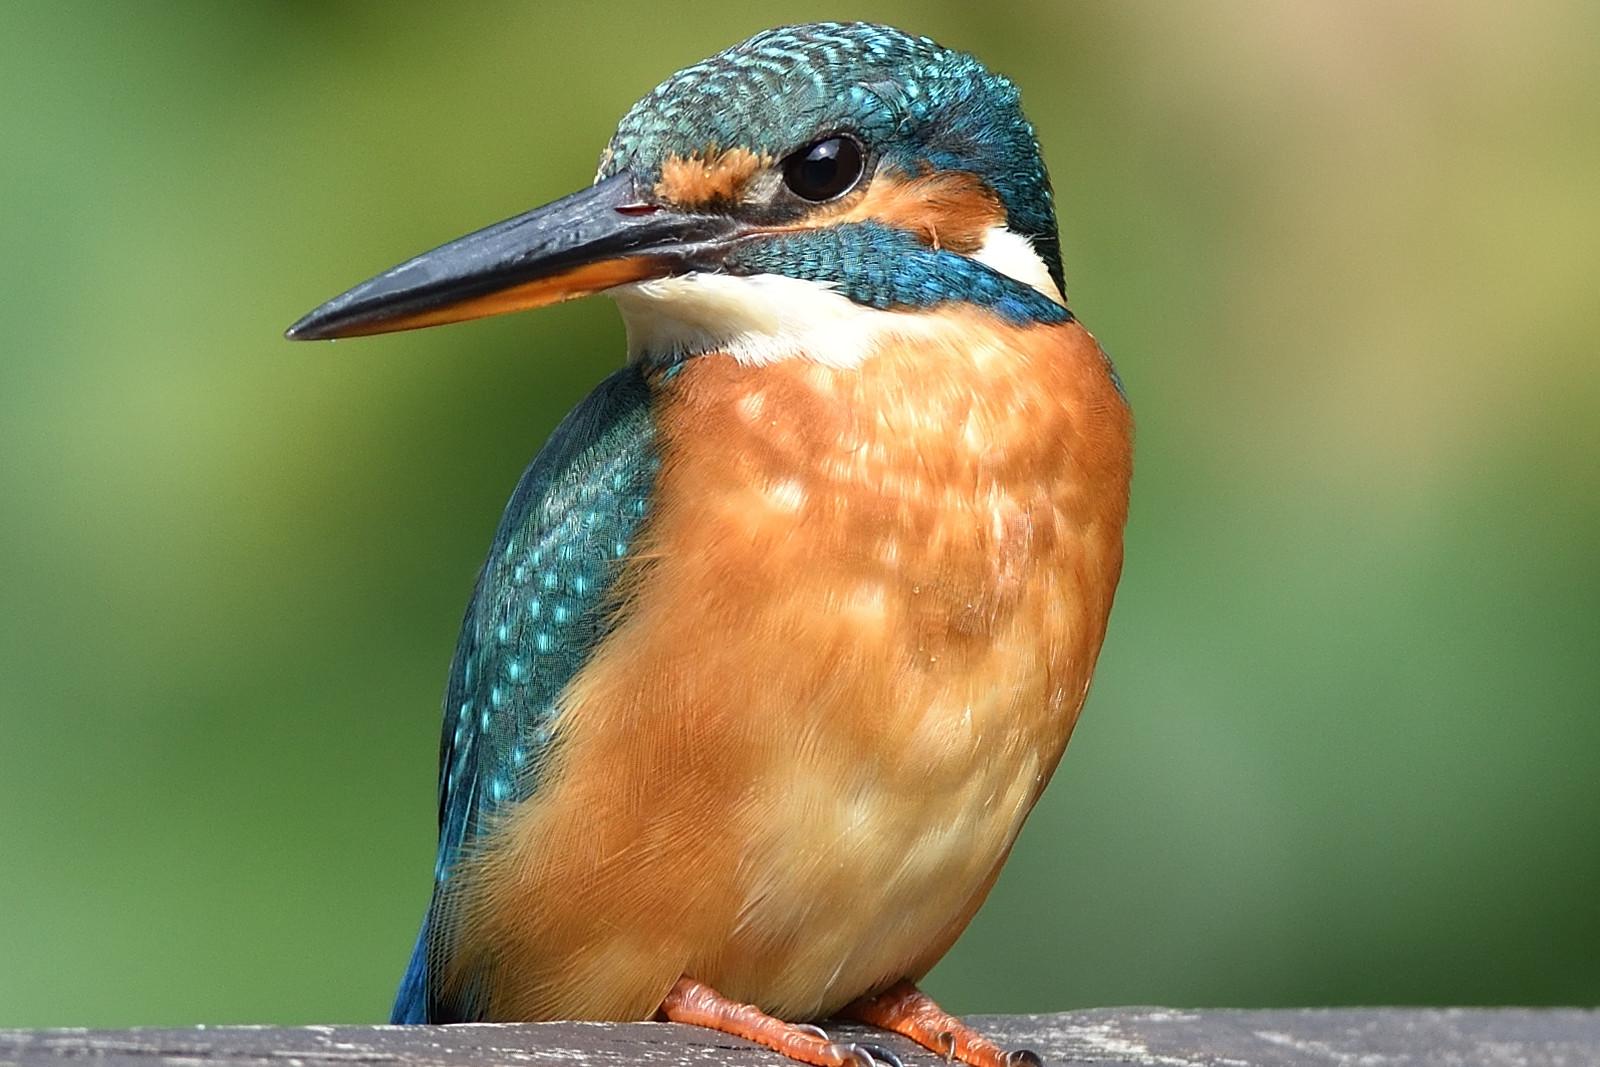 Common_Kingfisher_3960